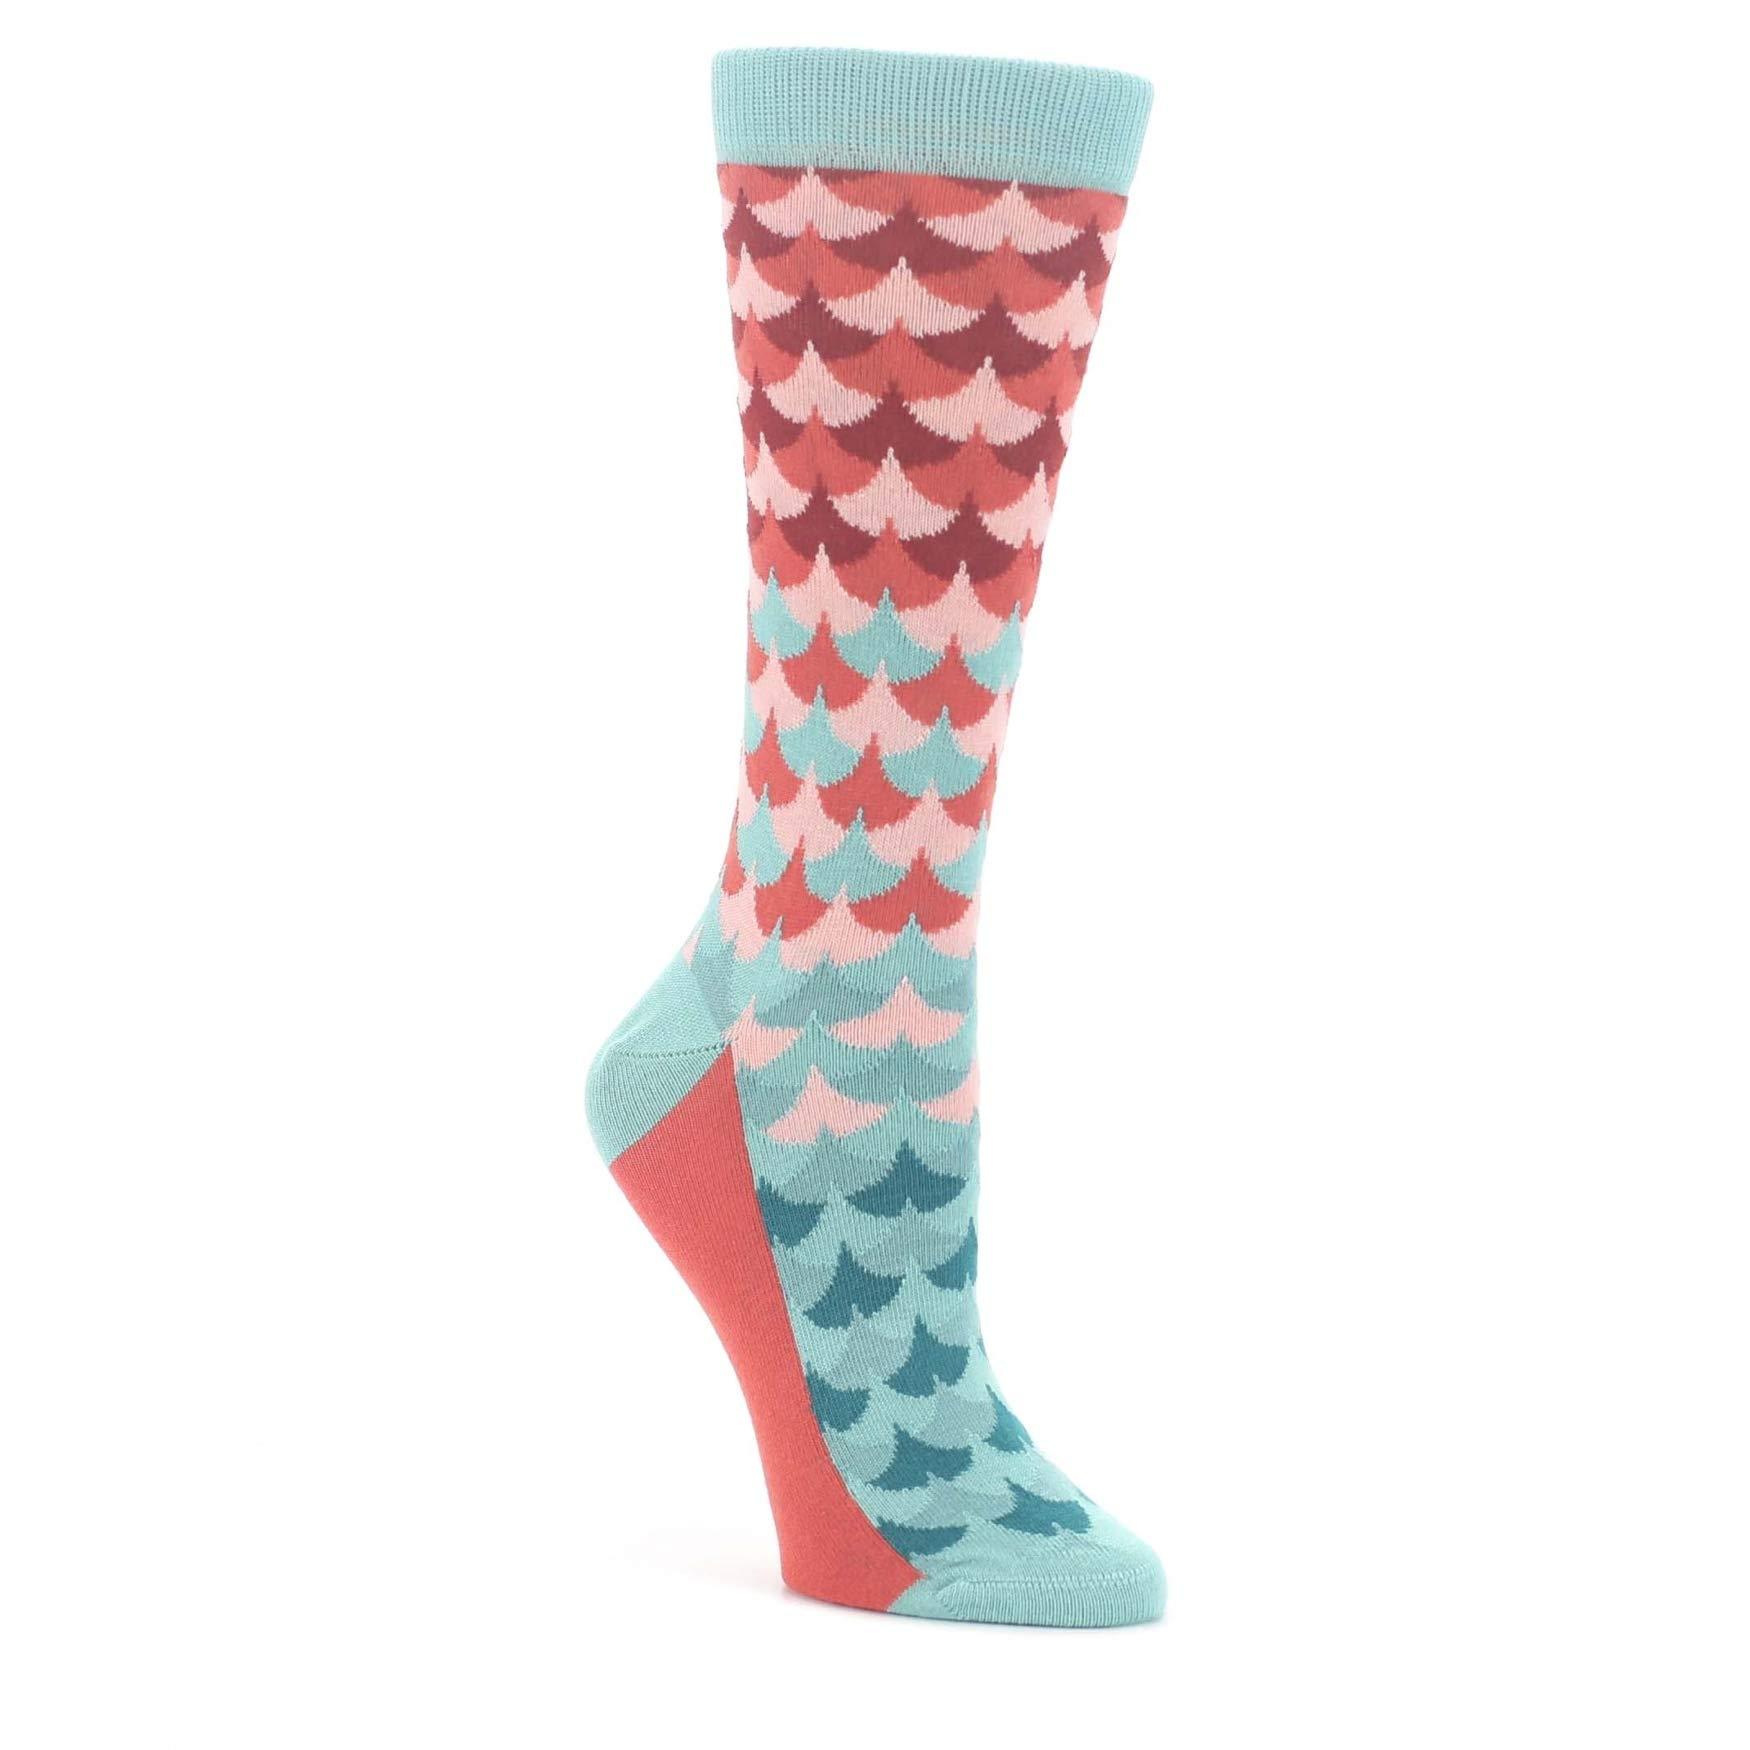 Teal Red Mermaid Scales Women's Dress Socks - Statement Sockwear